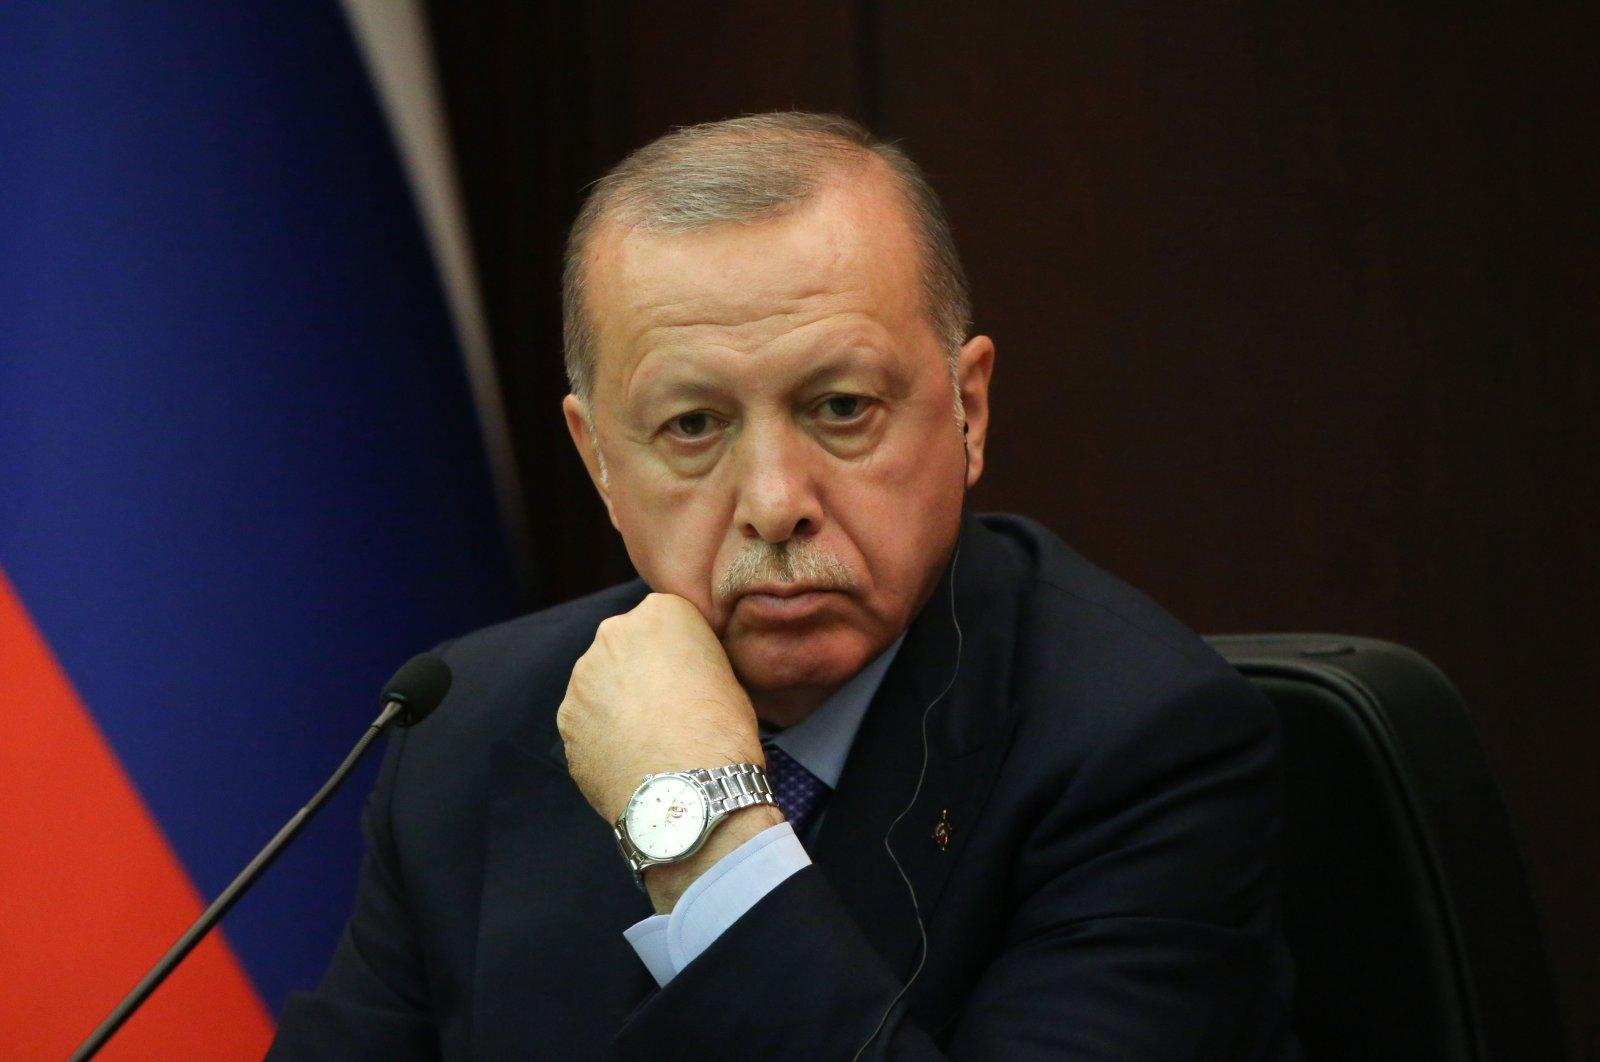 President Recep Tayyip Erdoğan during a meeting in Ankara, Turkey, Sept. 16, 2019. (Photo by Mikhail Svetlov/Getty Images)